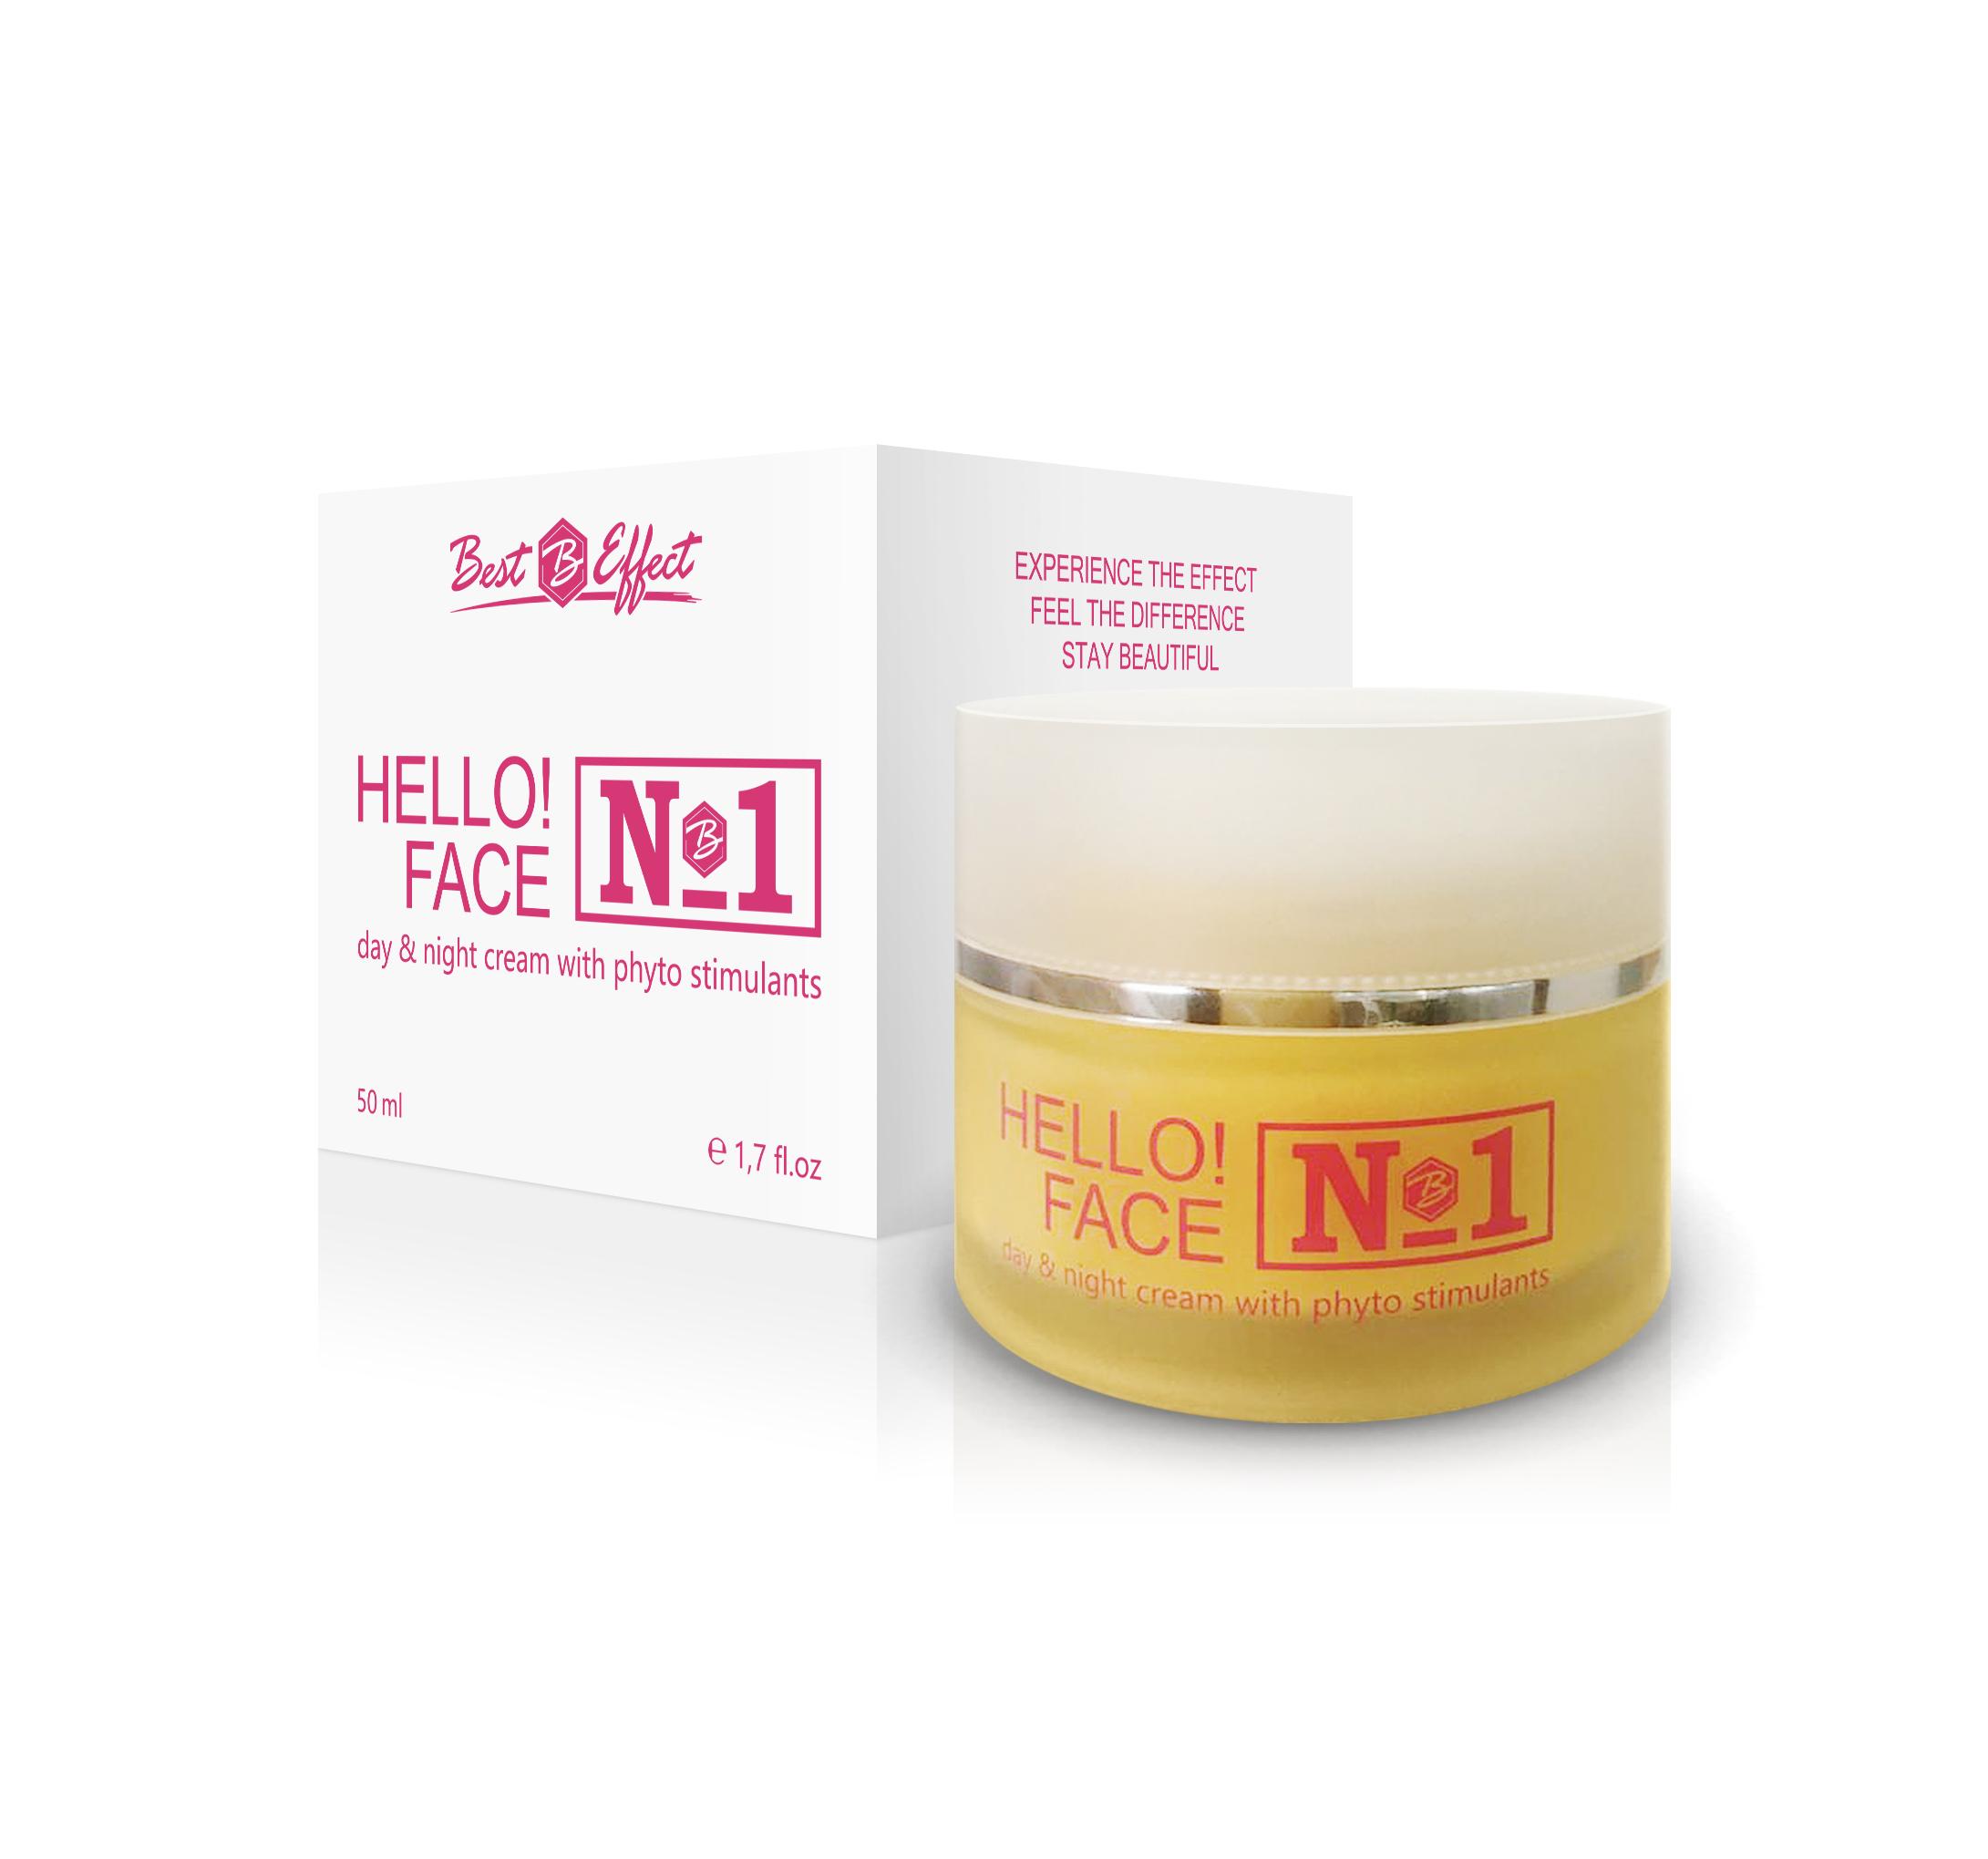 Hello!Face N1 day & night cream